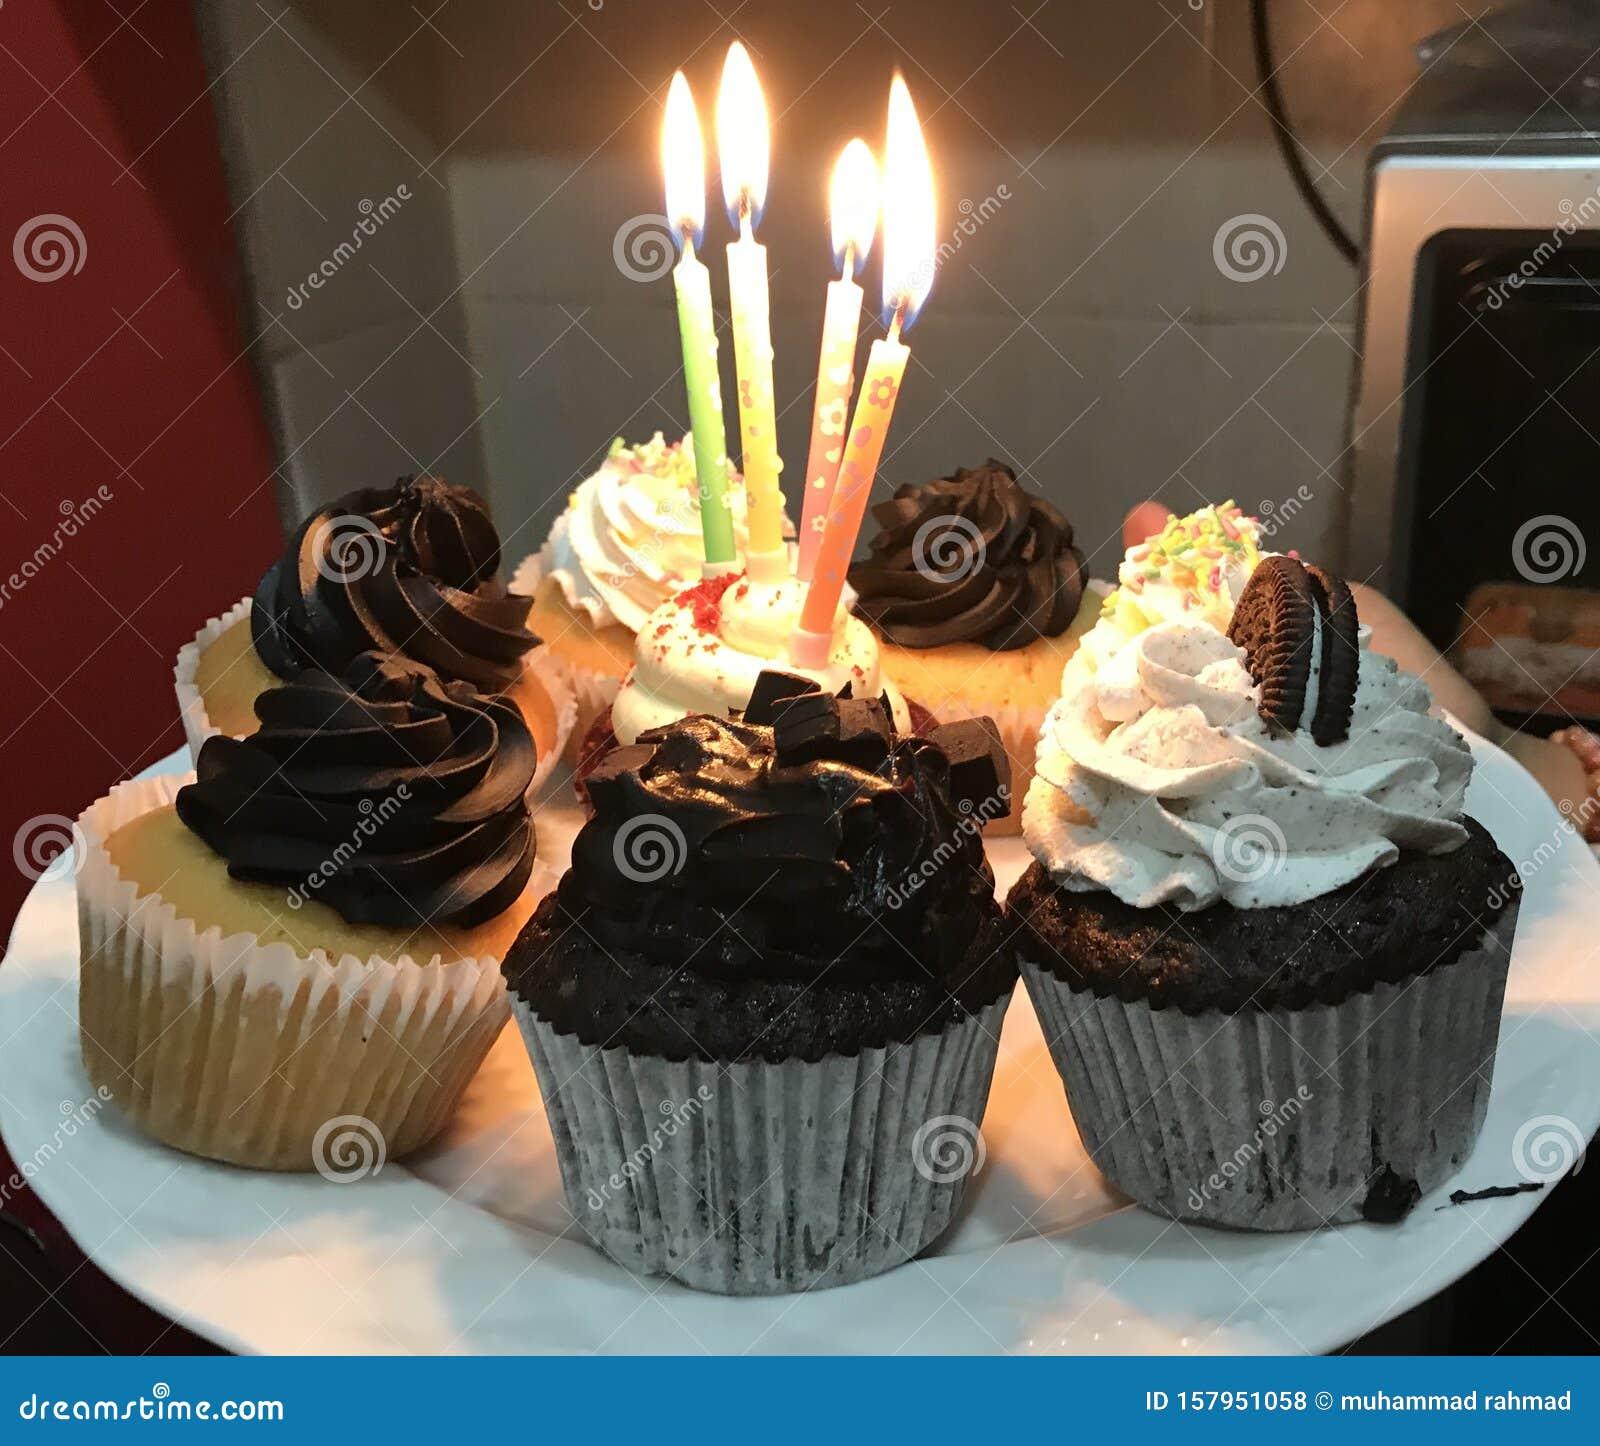 Pleasant Simple Birthday Cakes Celebrated With Friends Stock Photo Image Personalised Birthday Cards Veneteletsinfo